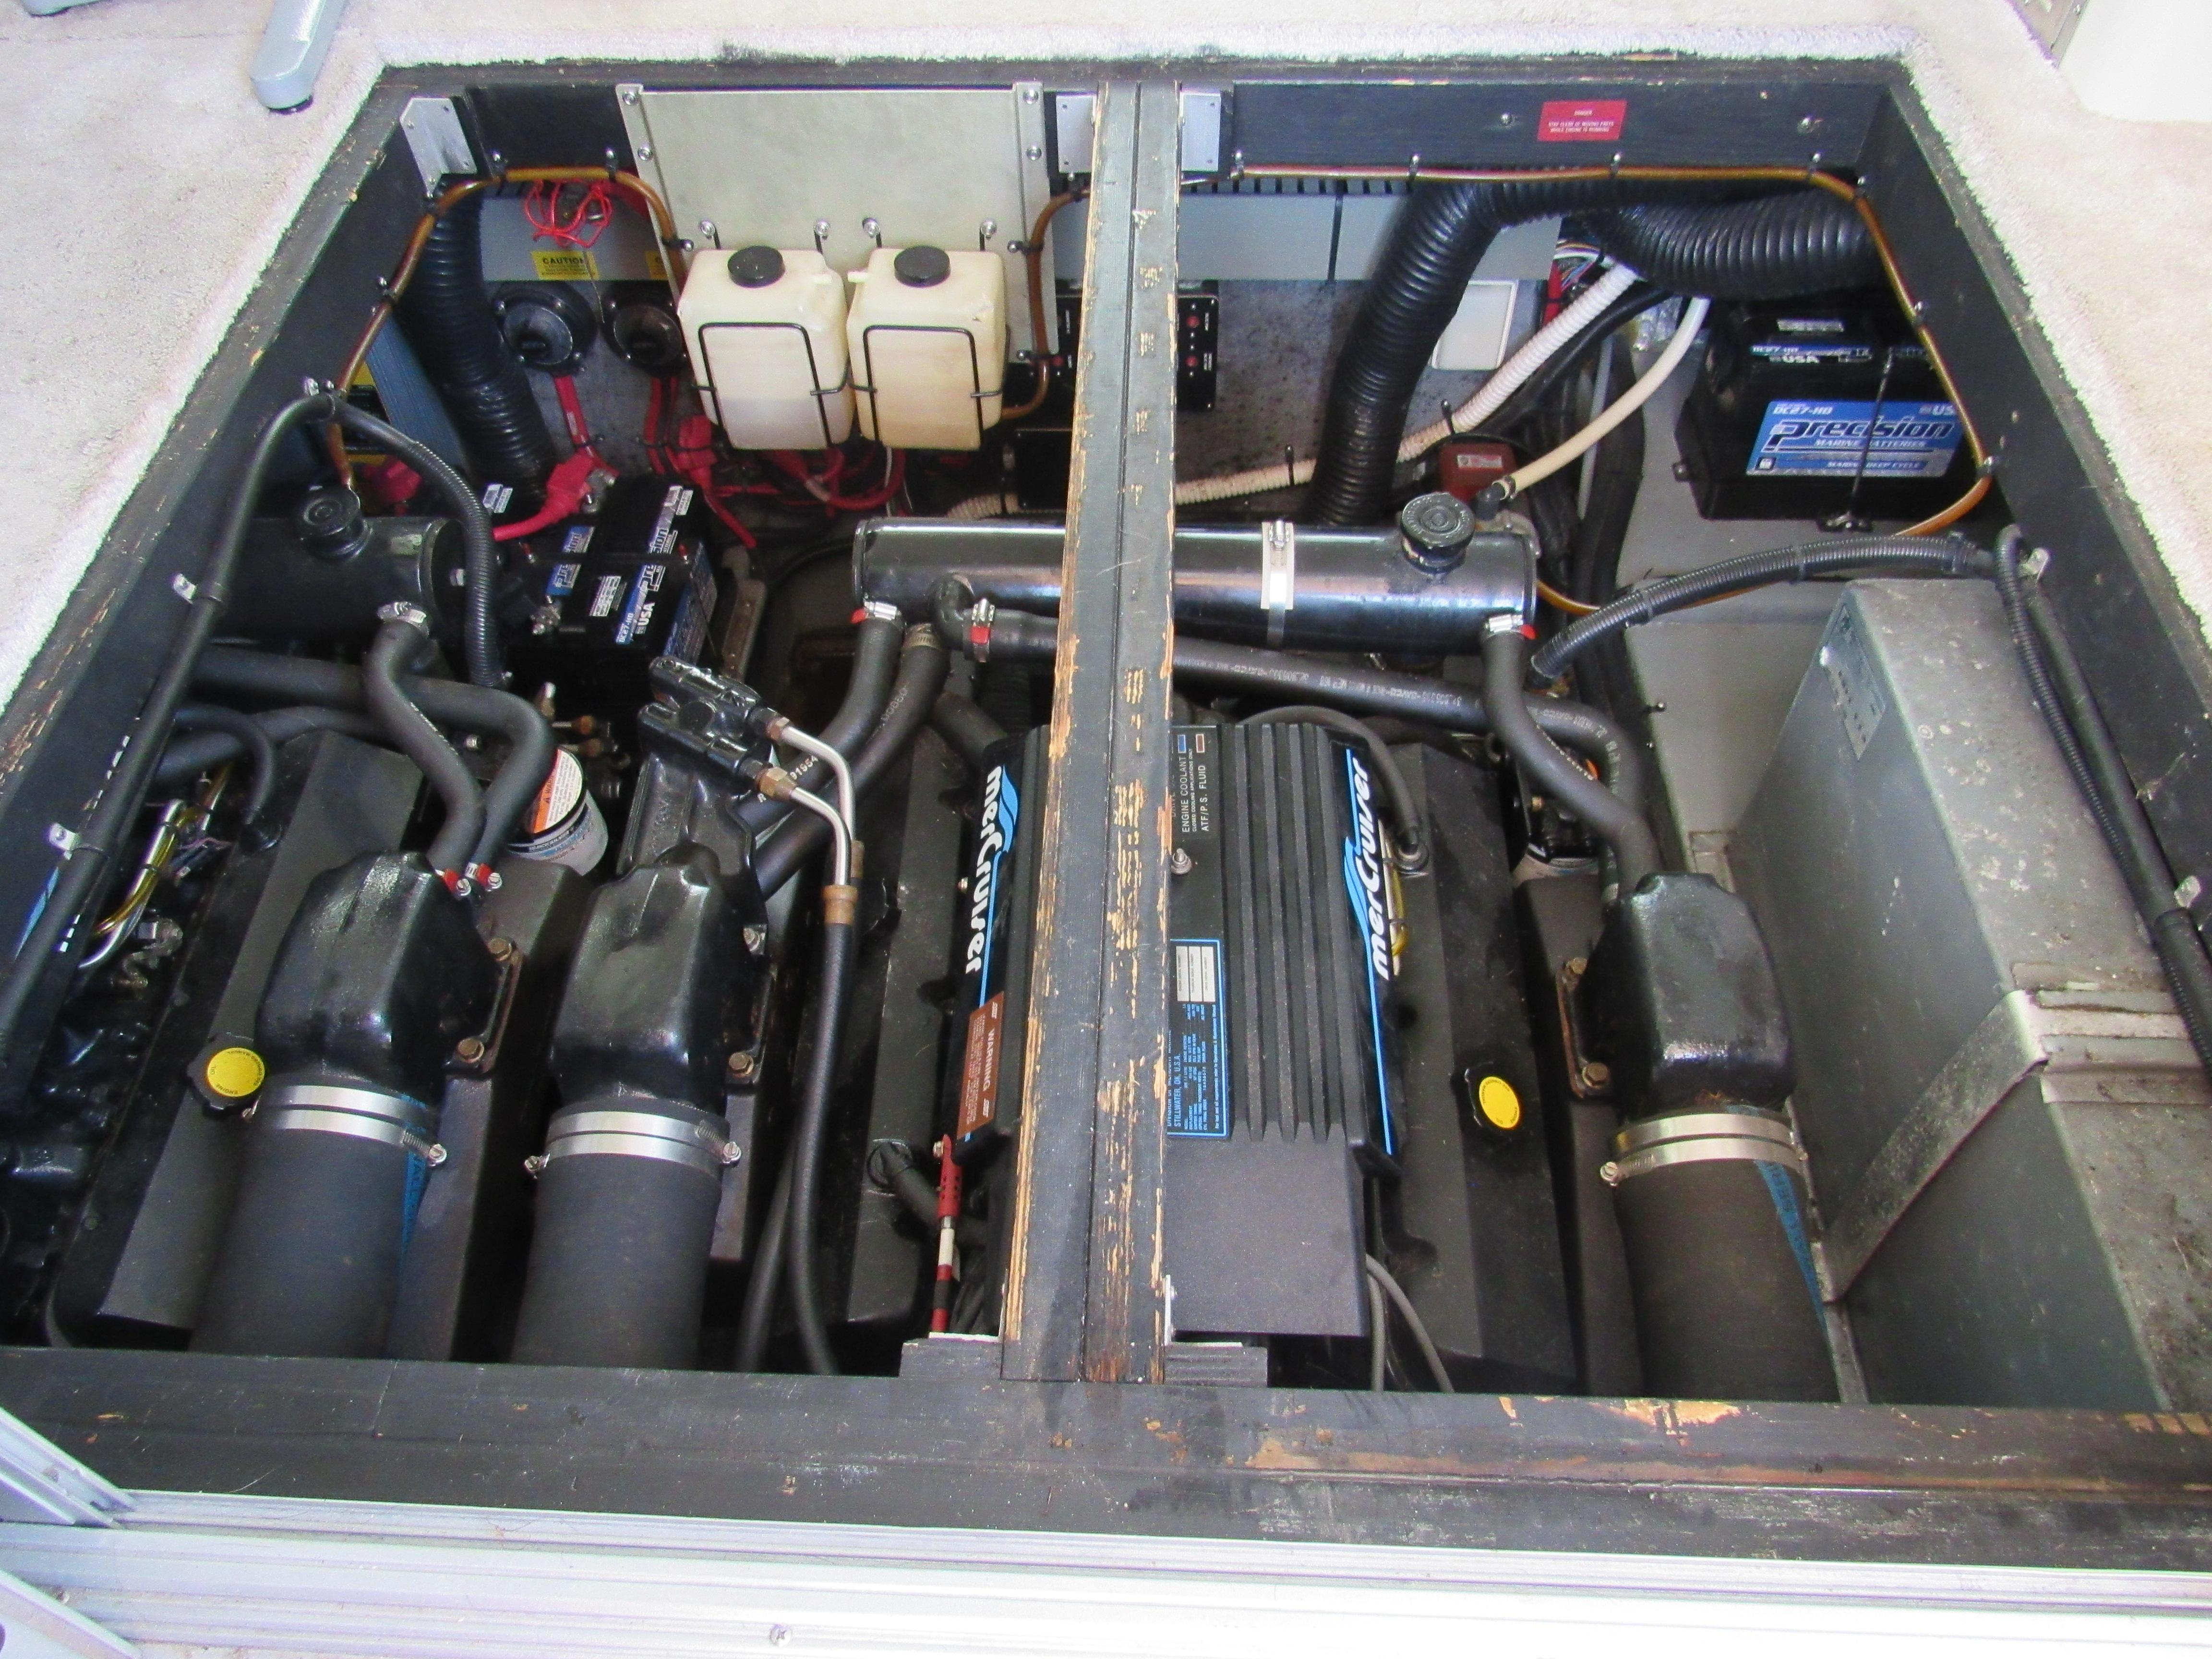 Clean Generator Compartment